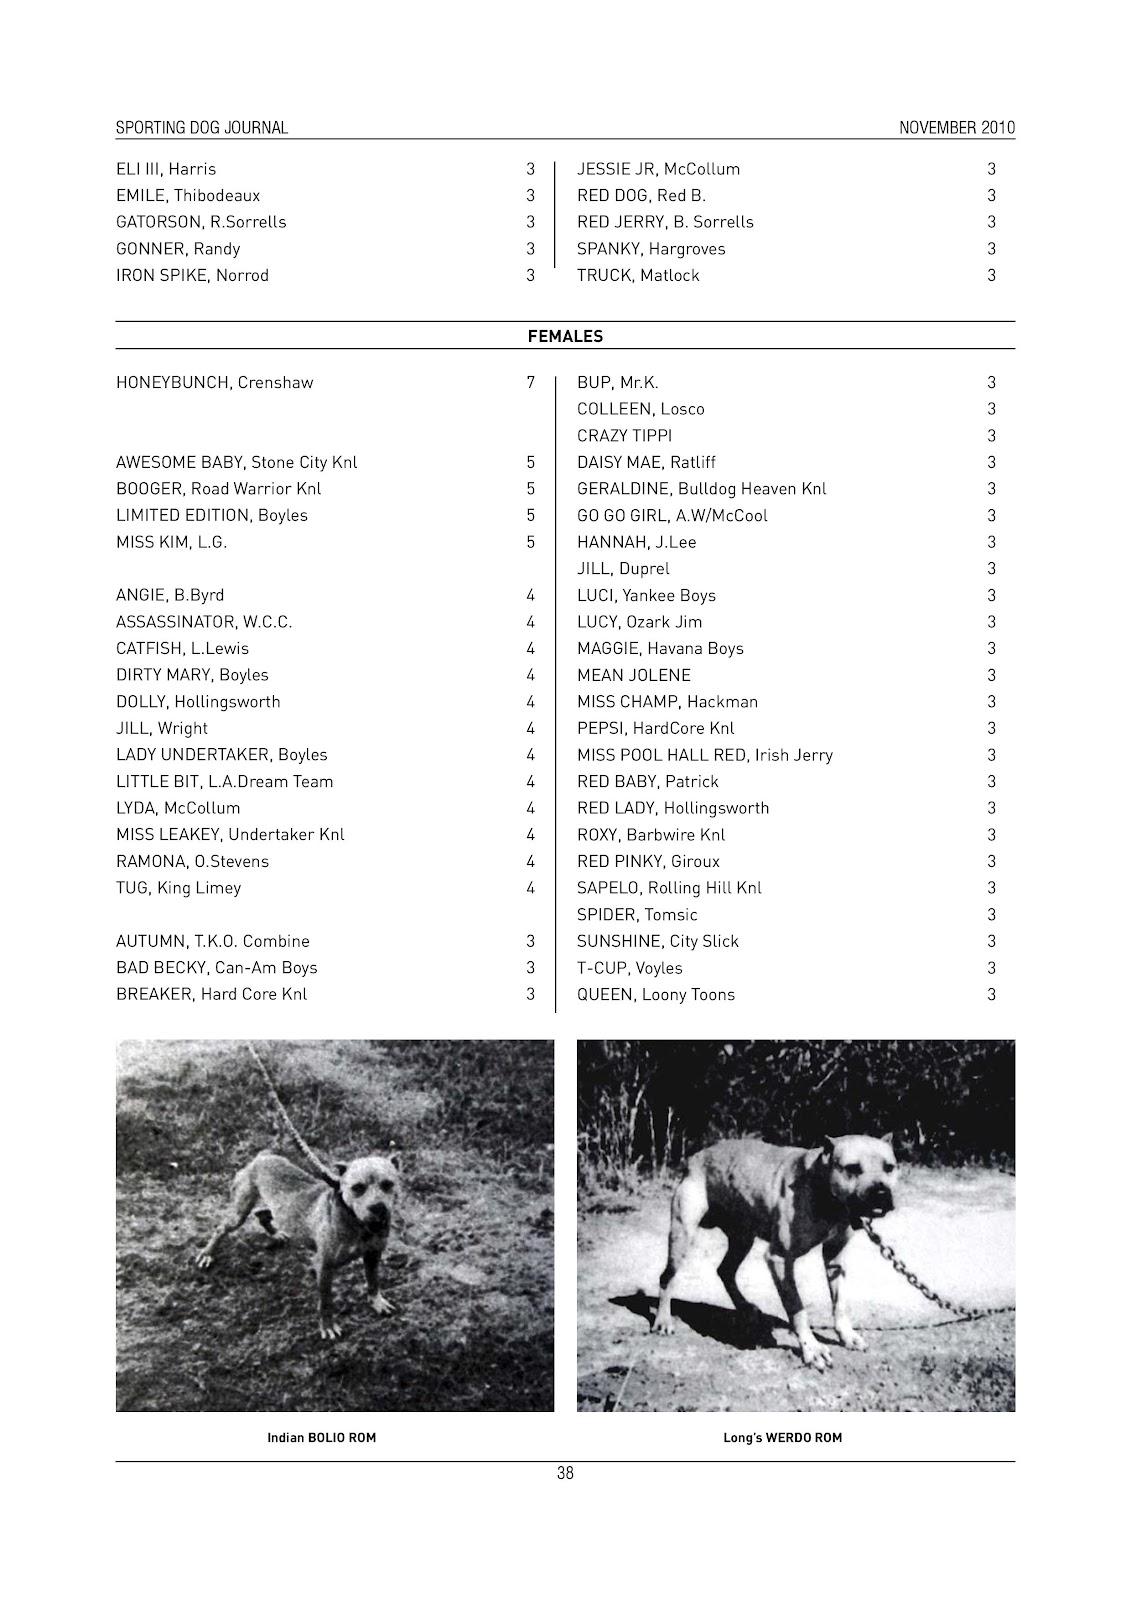 SPORTING DOG JOURNAL NOVEMBER/2010 | SPORTING DOG NEWS